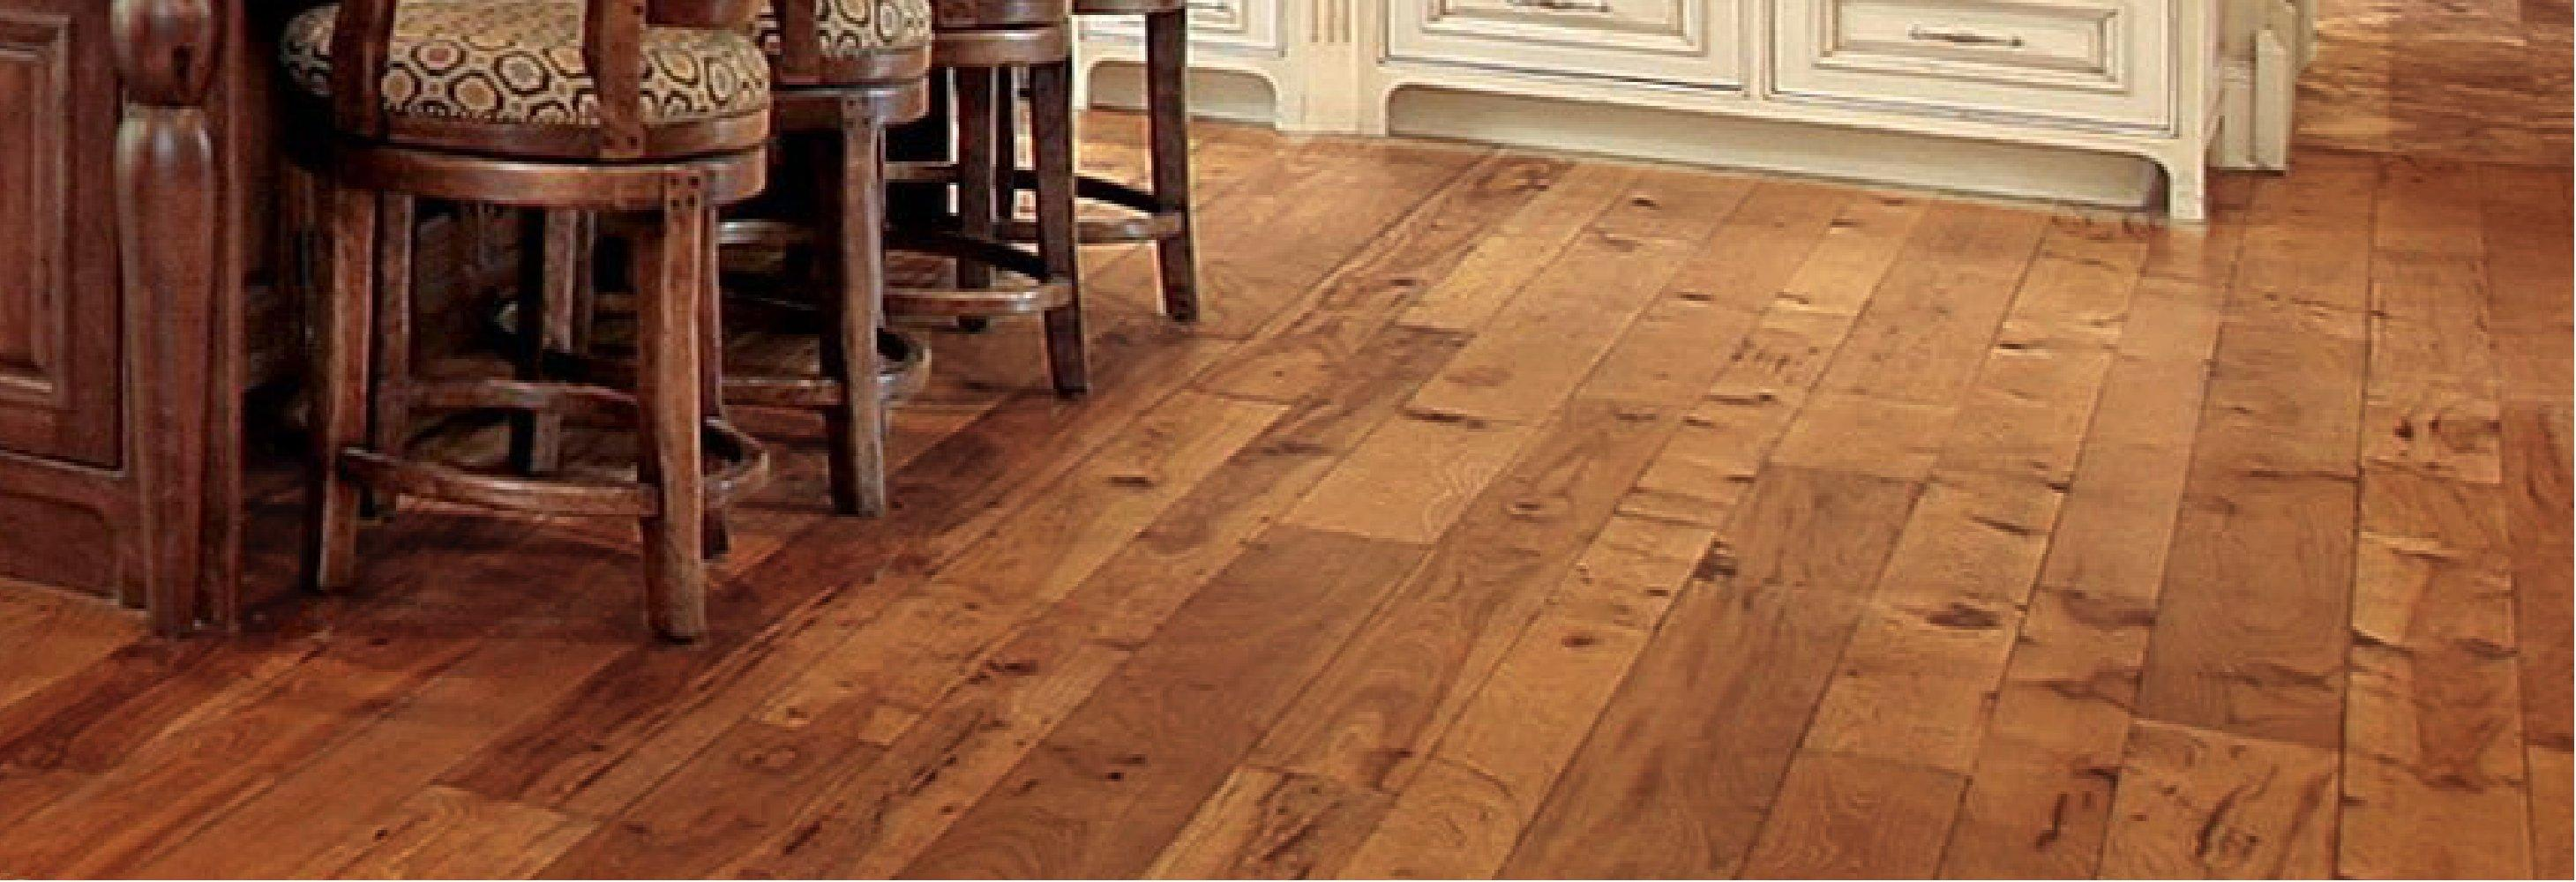 oak floors oak wood flooring ILJAJQE